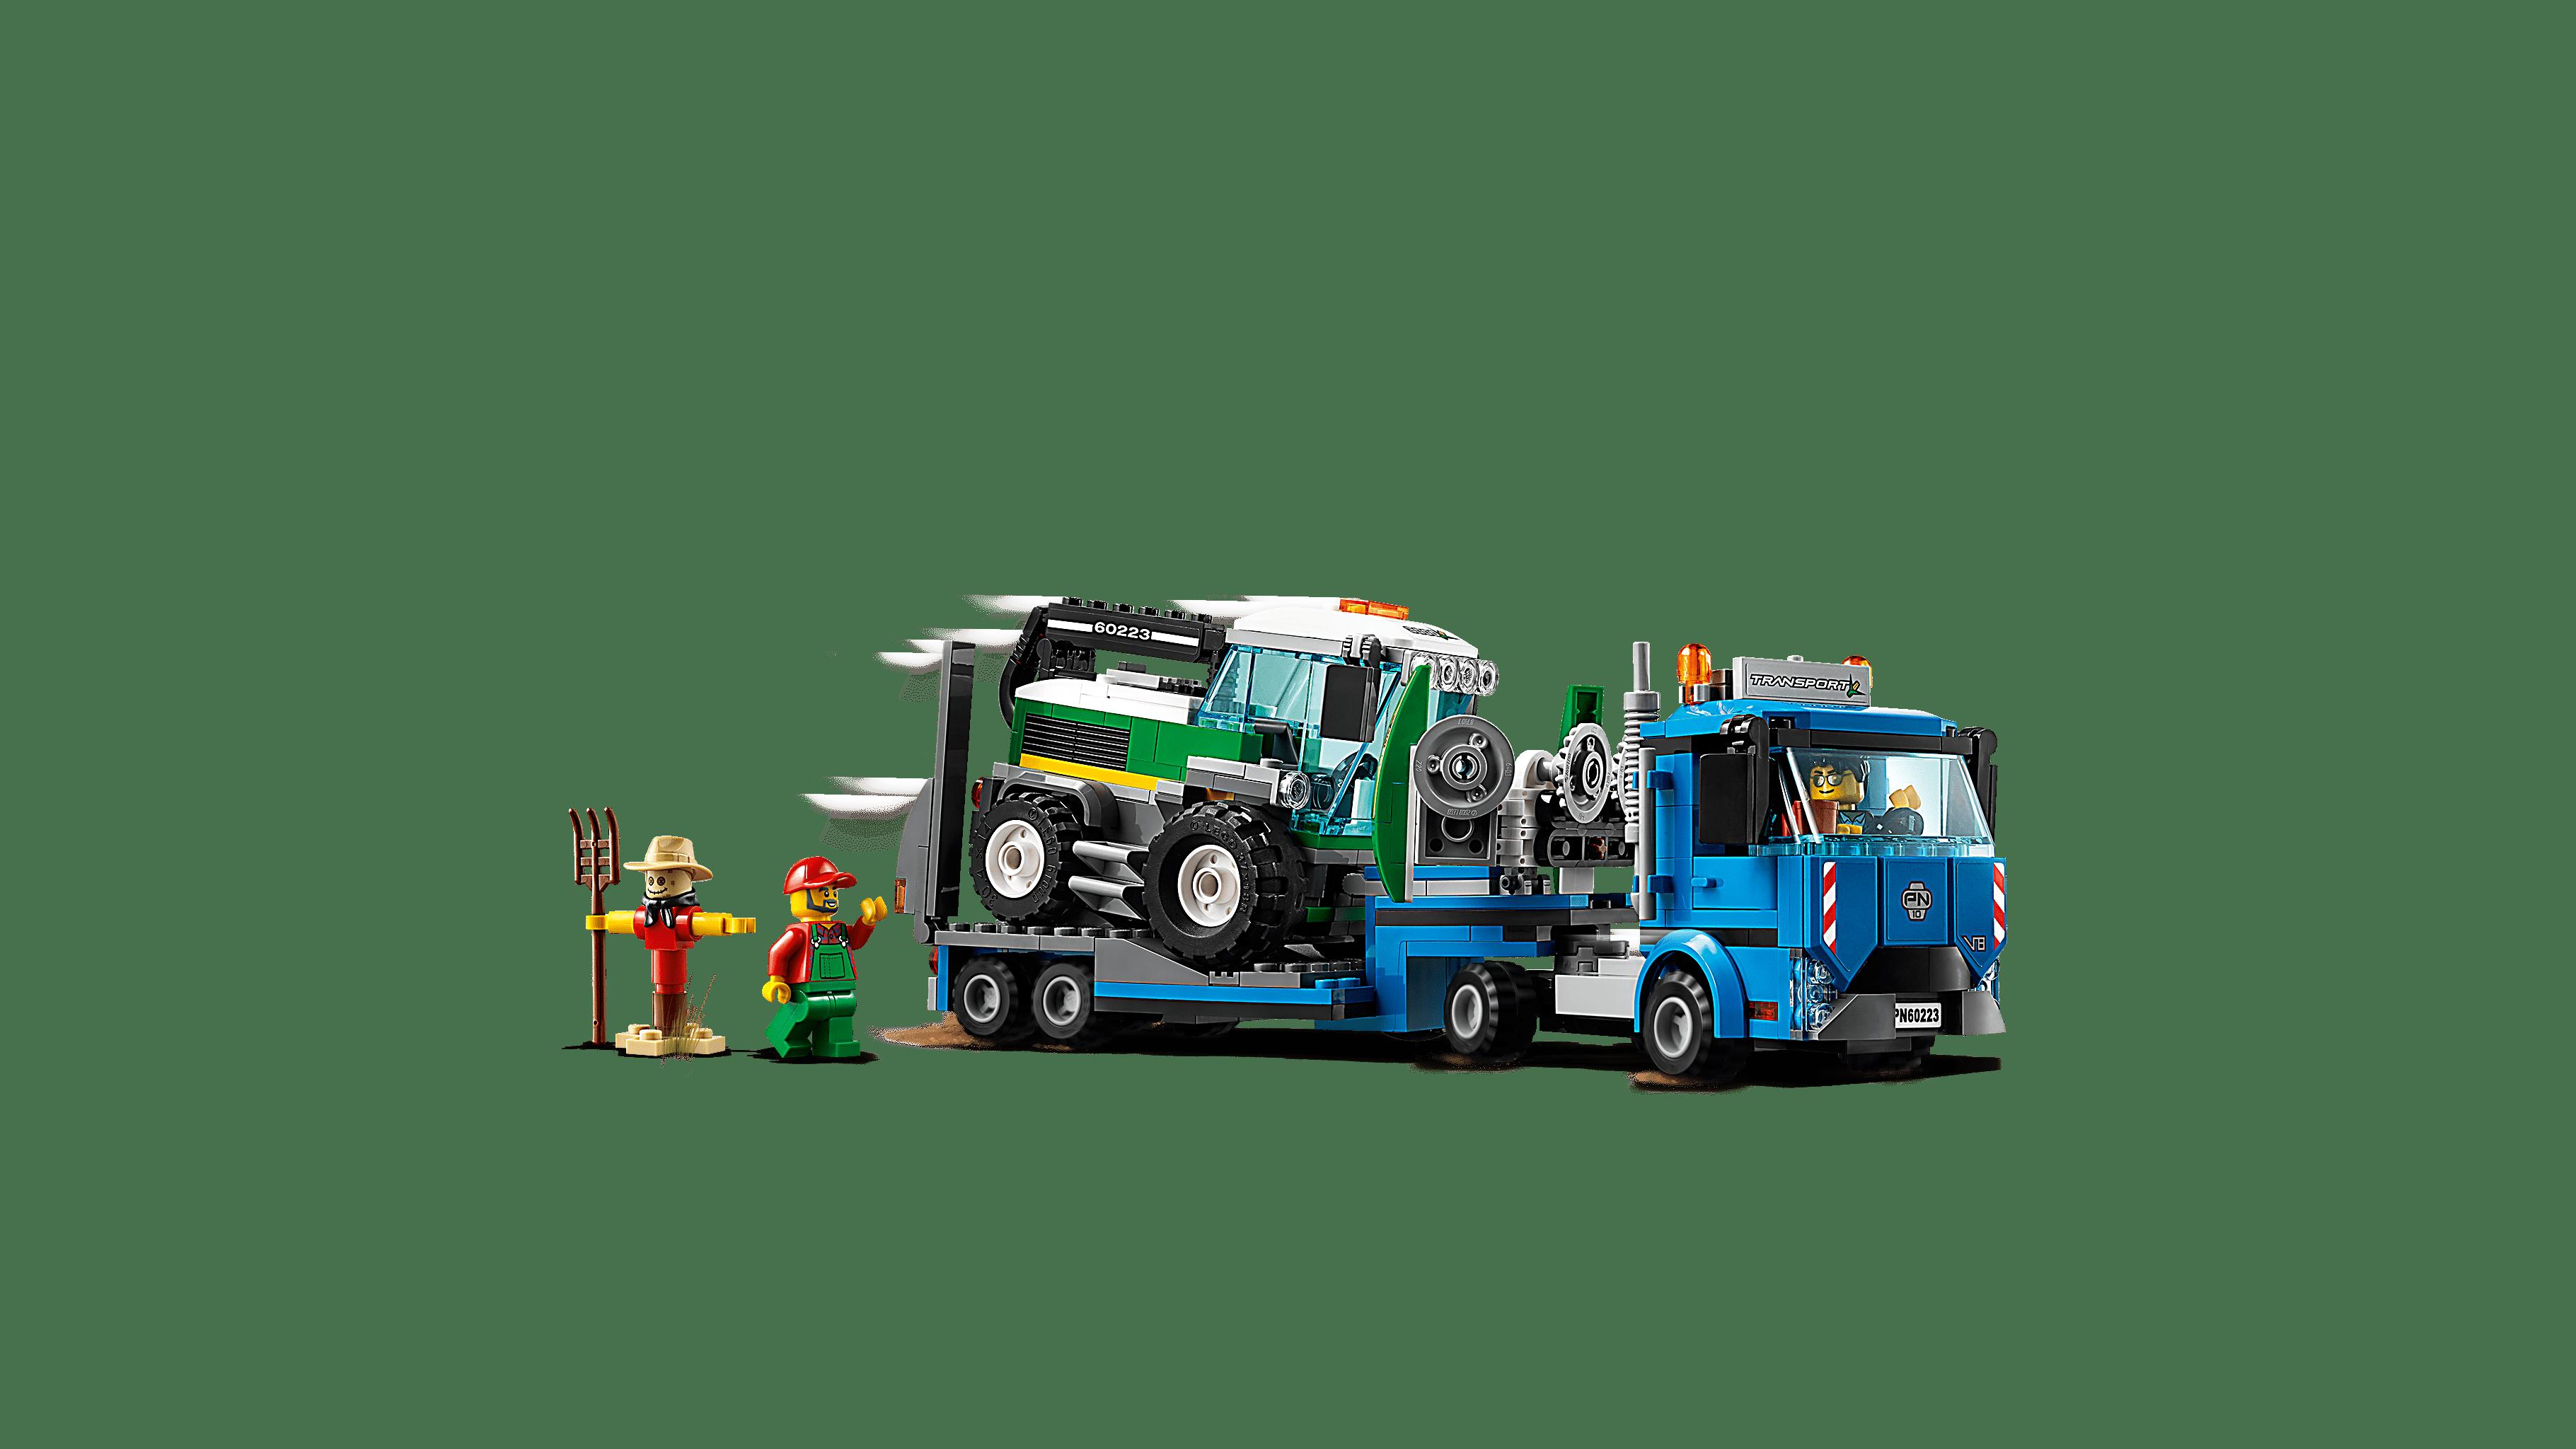 60223 Transporter für Mähdrescher LEGO City 2er Set 60181 Forsttraktor